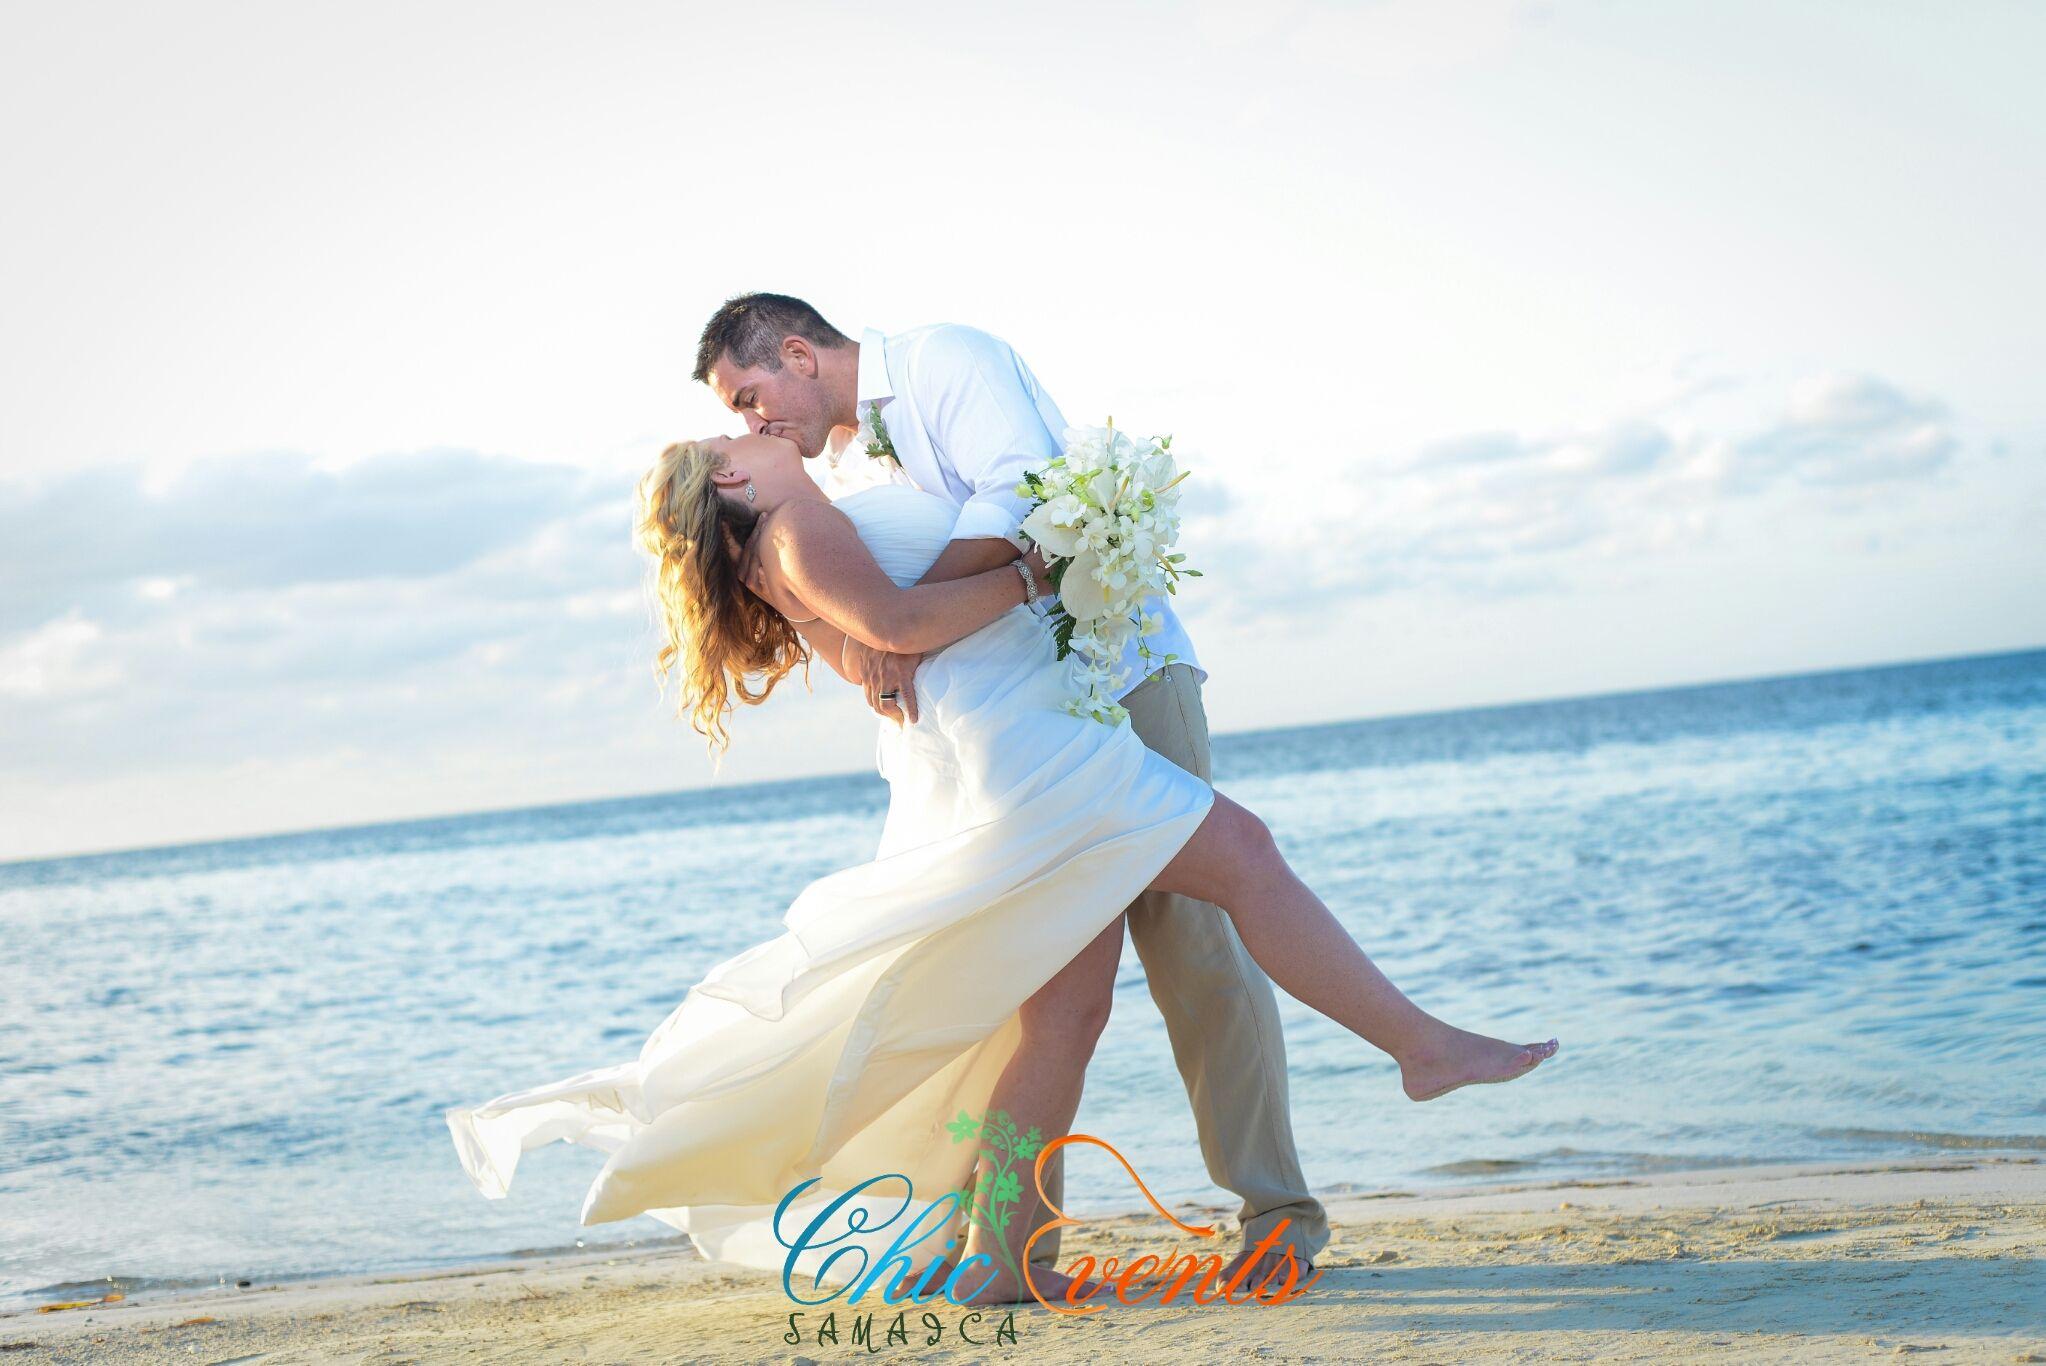 Day of Wedding Coordinator in Jamaica Cruise ship